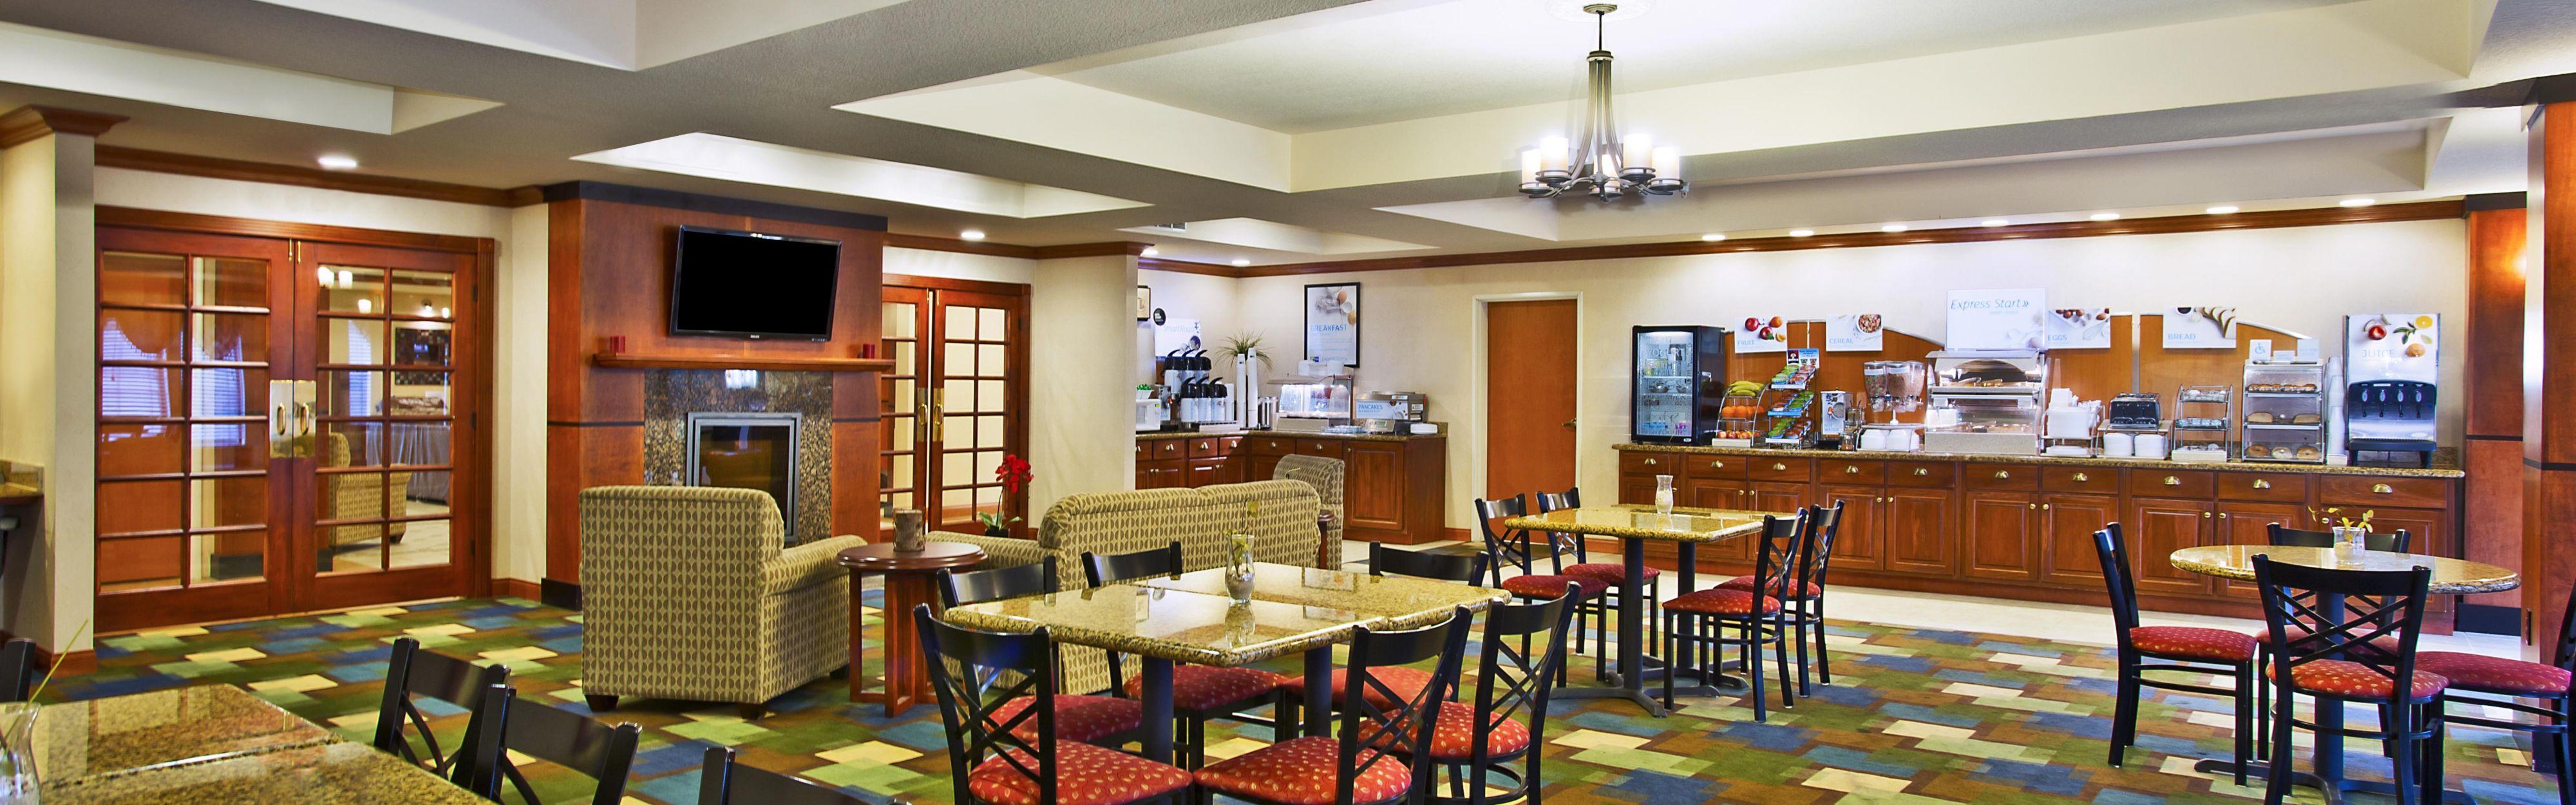 Holiday Inn Express & Suites East Lansing image 3